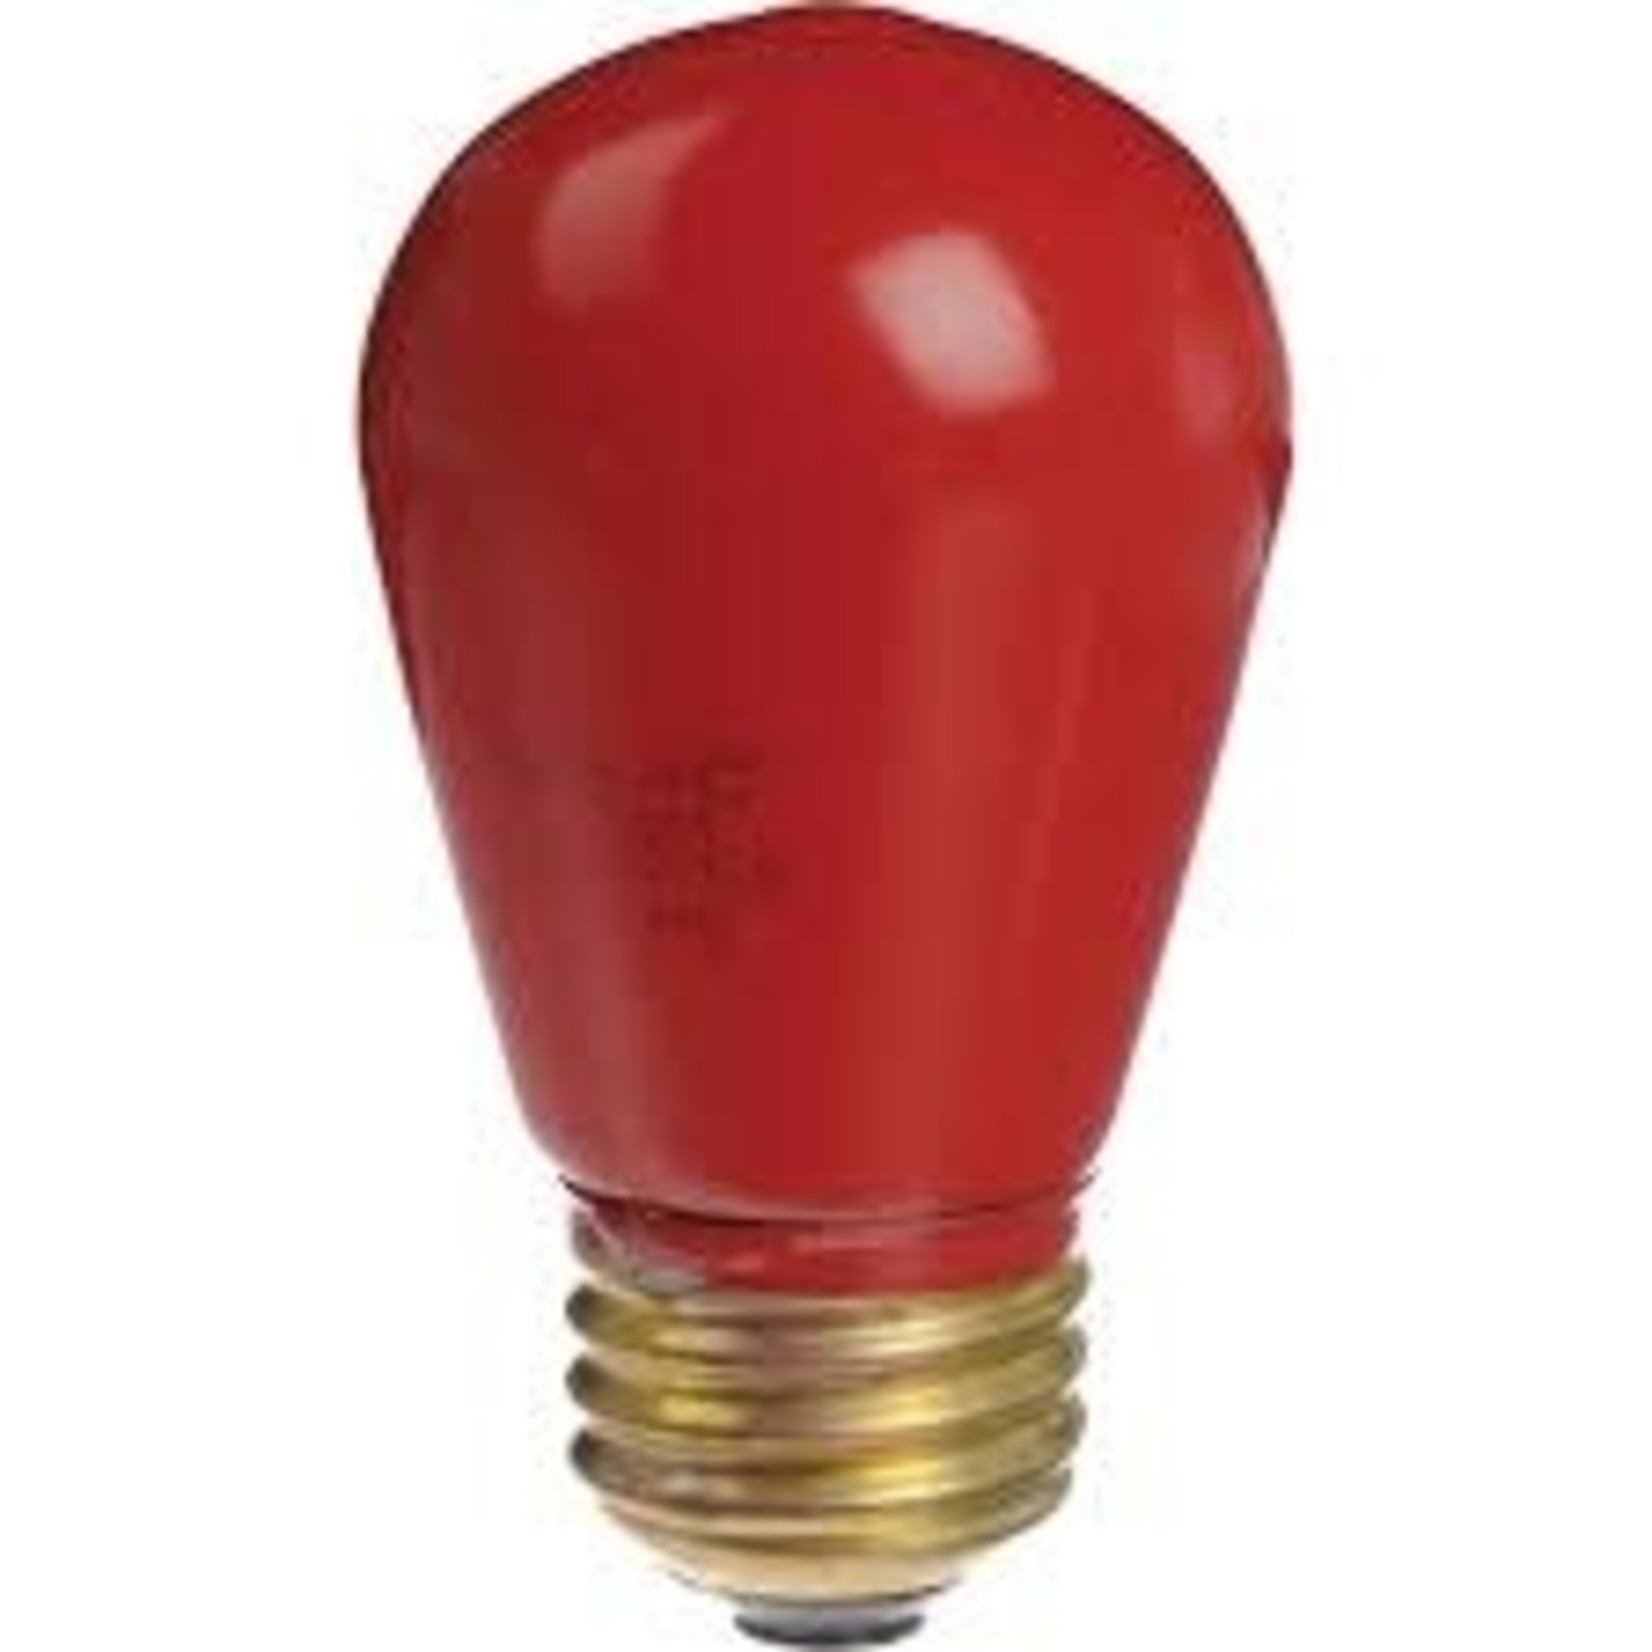 Delta Photography Supplies Bright Lab Jr. Safelight (RED)